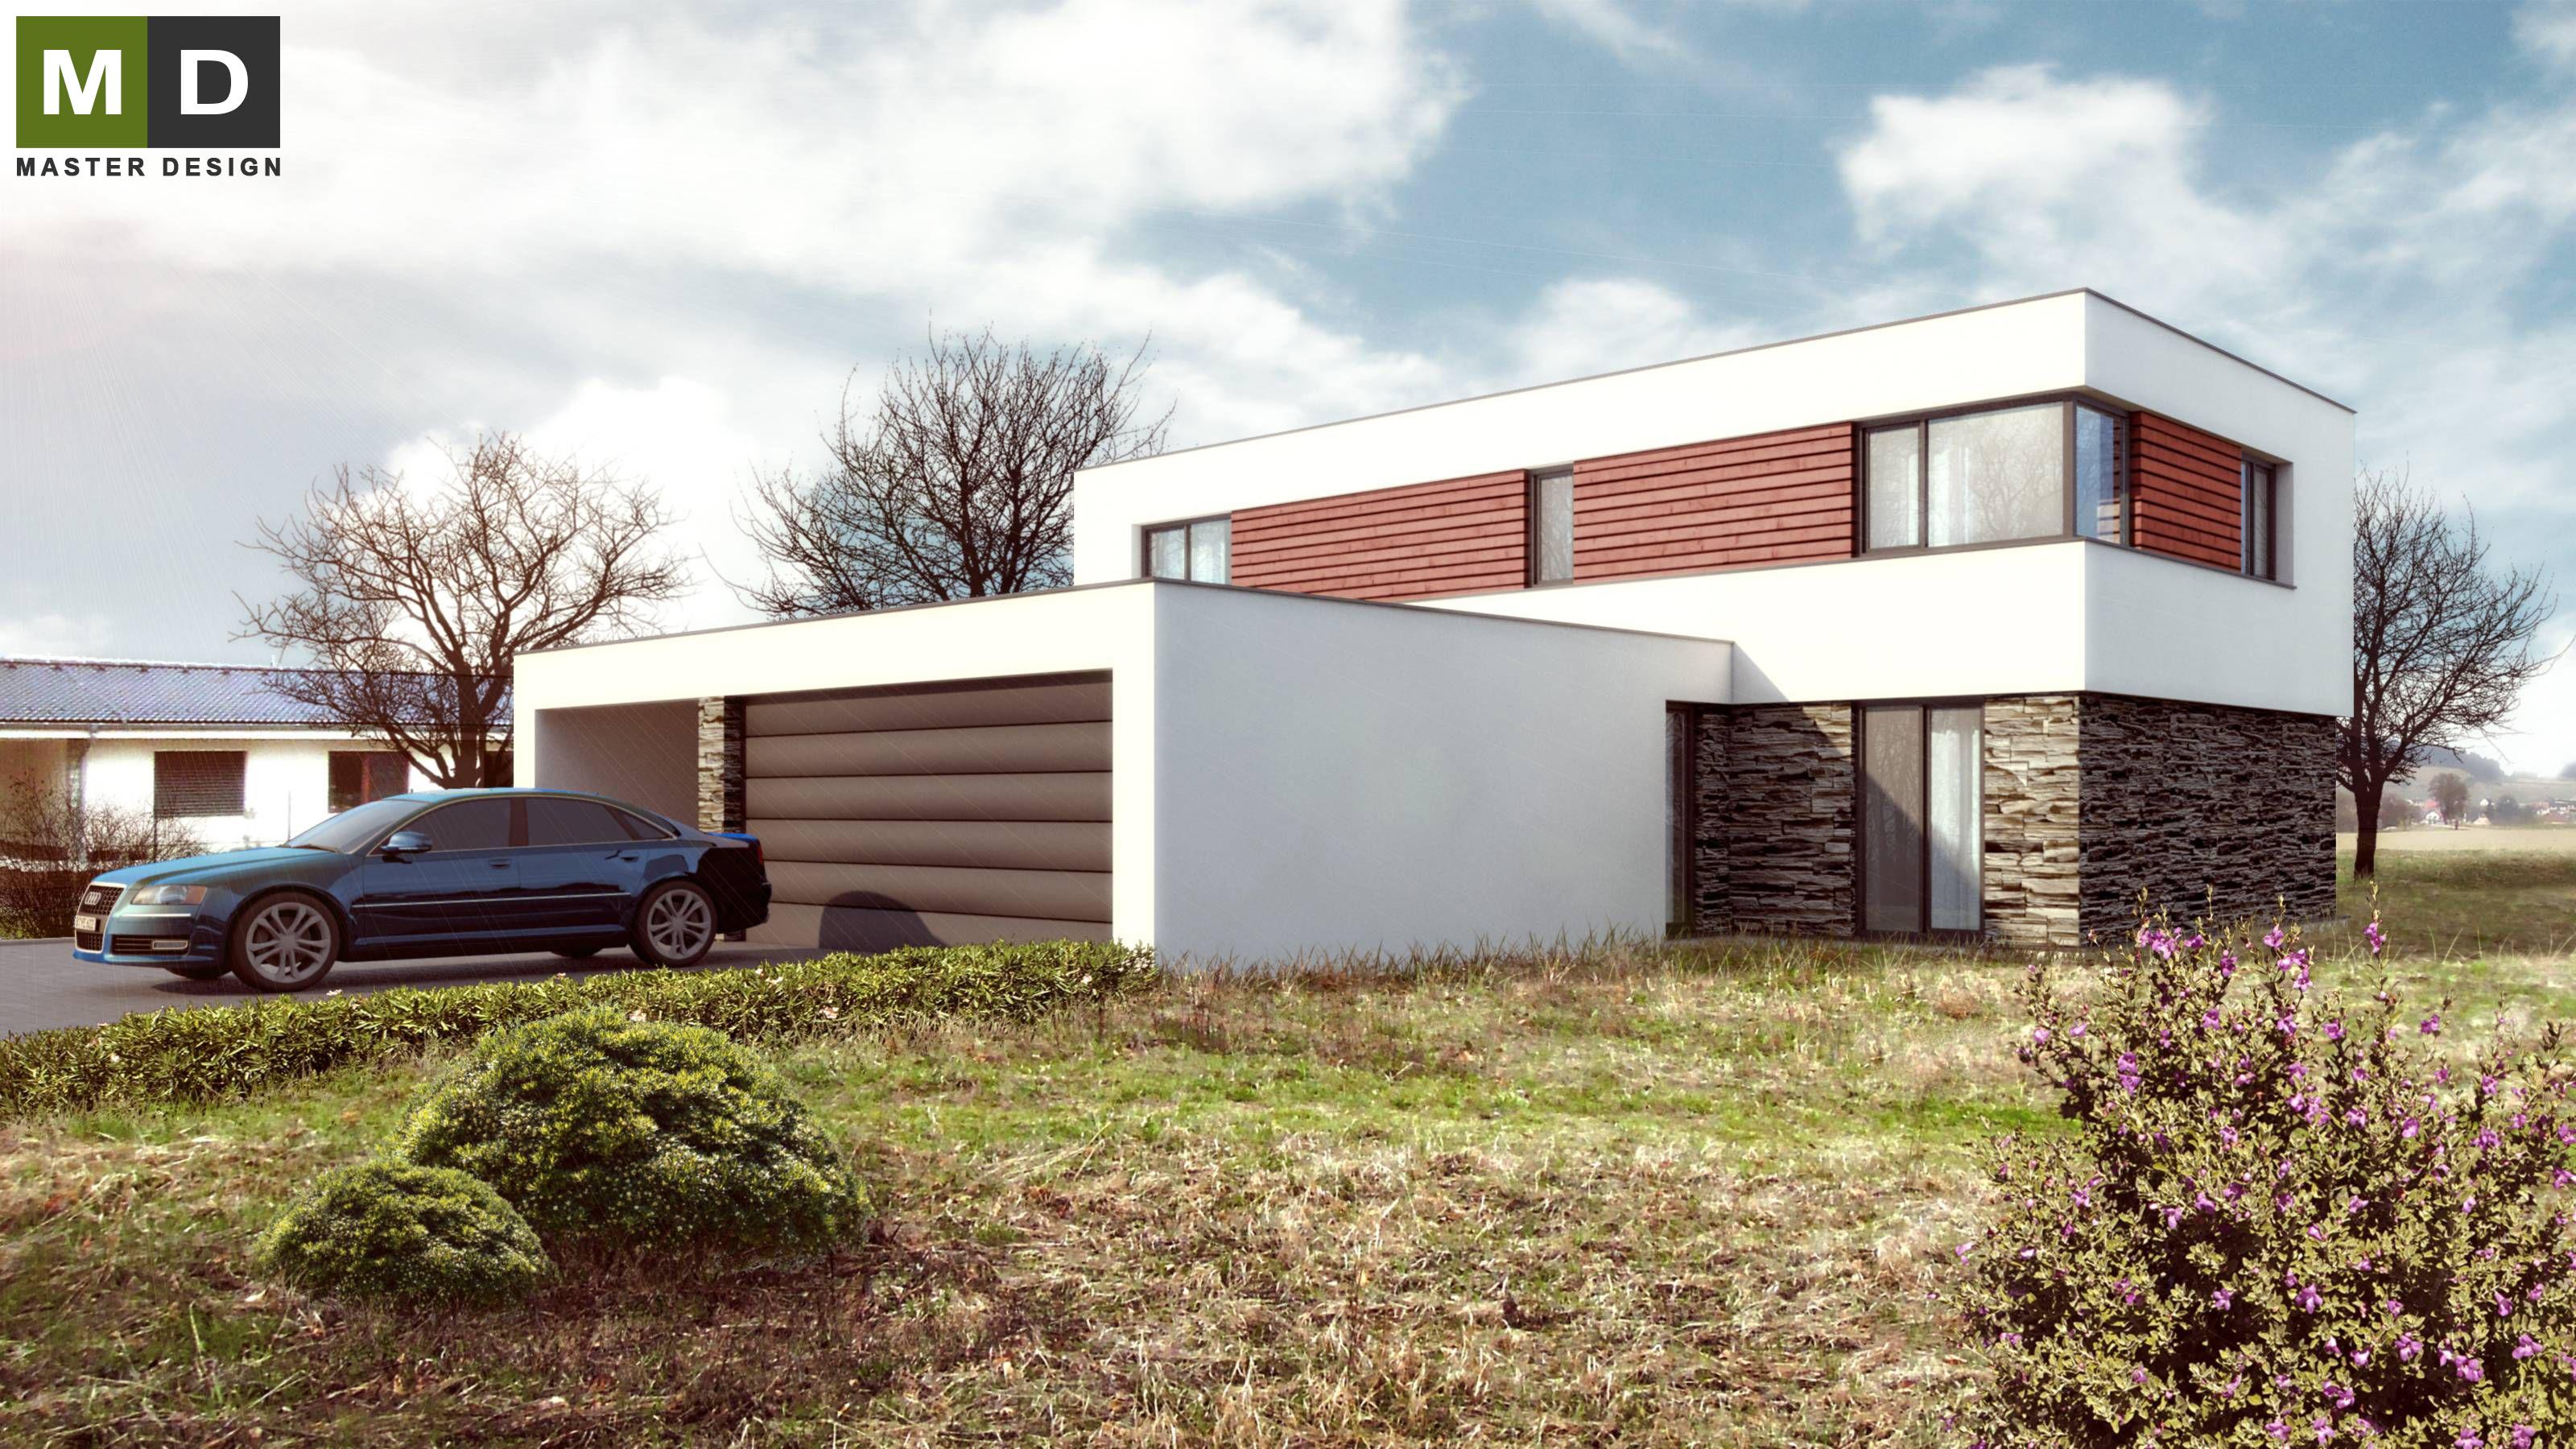 Exceptional Home Design Zlín Part - 12: ... Luxury Low Energy House With A Flat Roof - Zlín - Vizualizace 3 ...